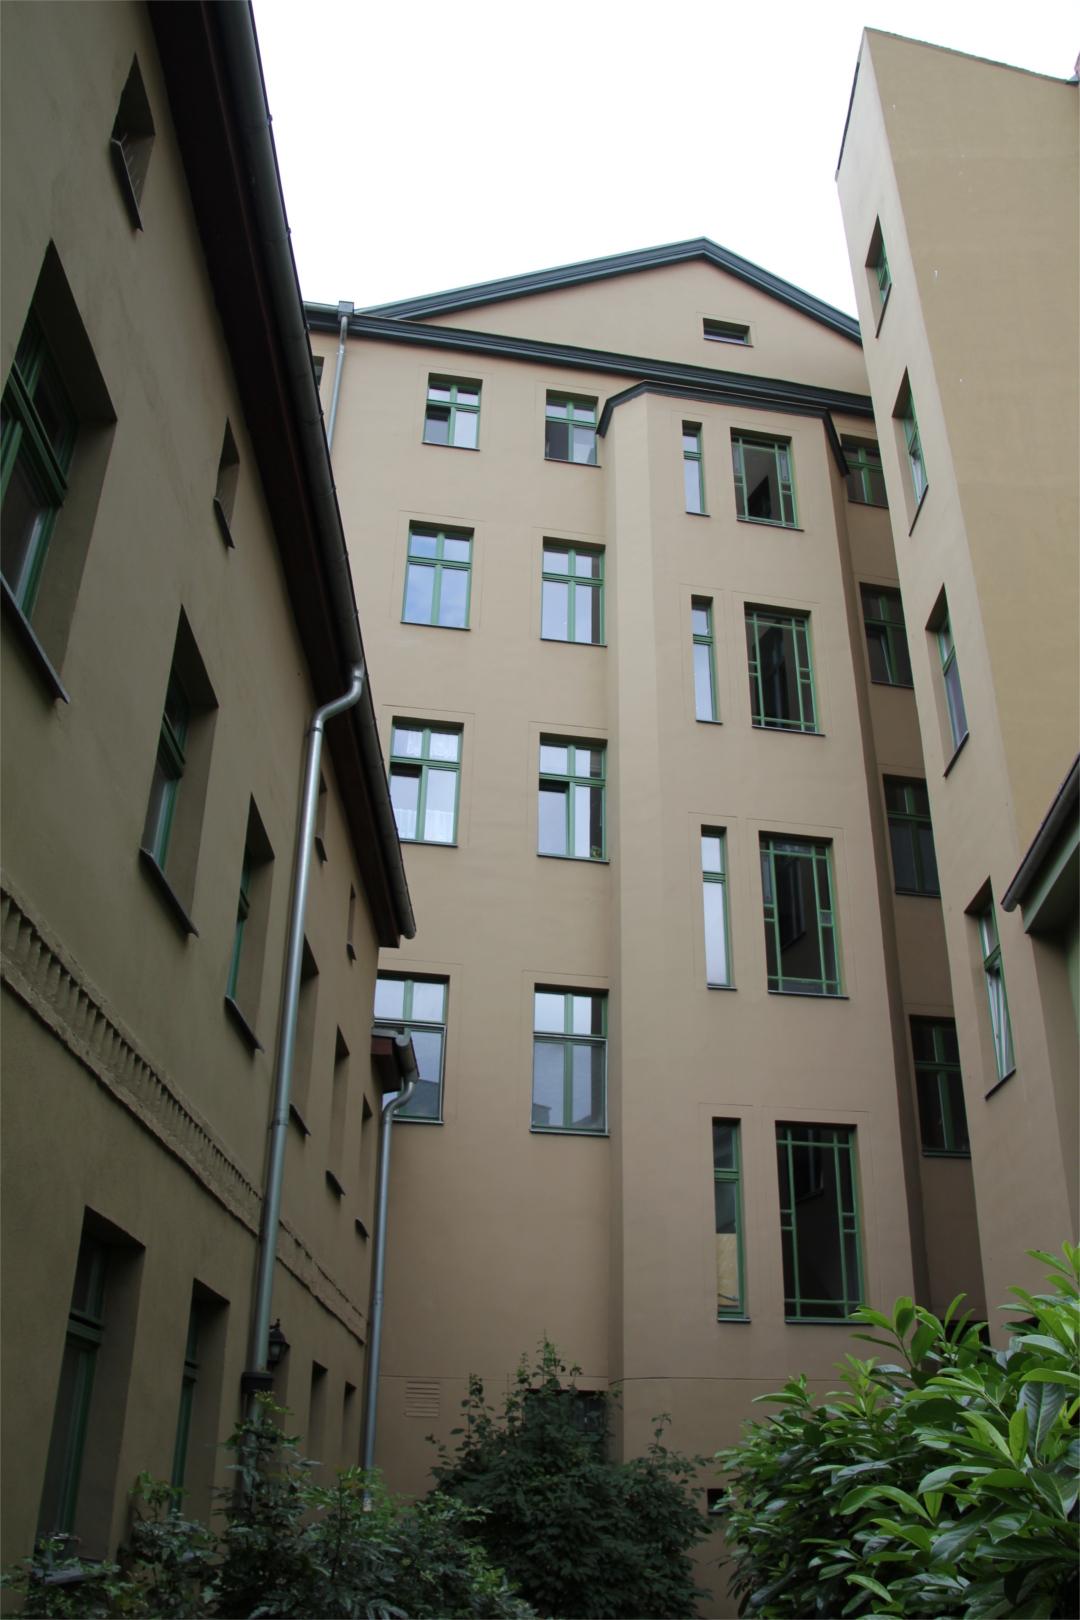 Grünstr-21-12555-Berlin-Hofseite_small